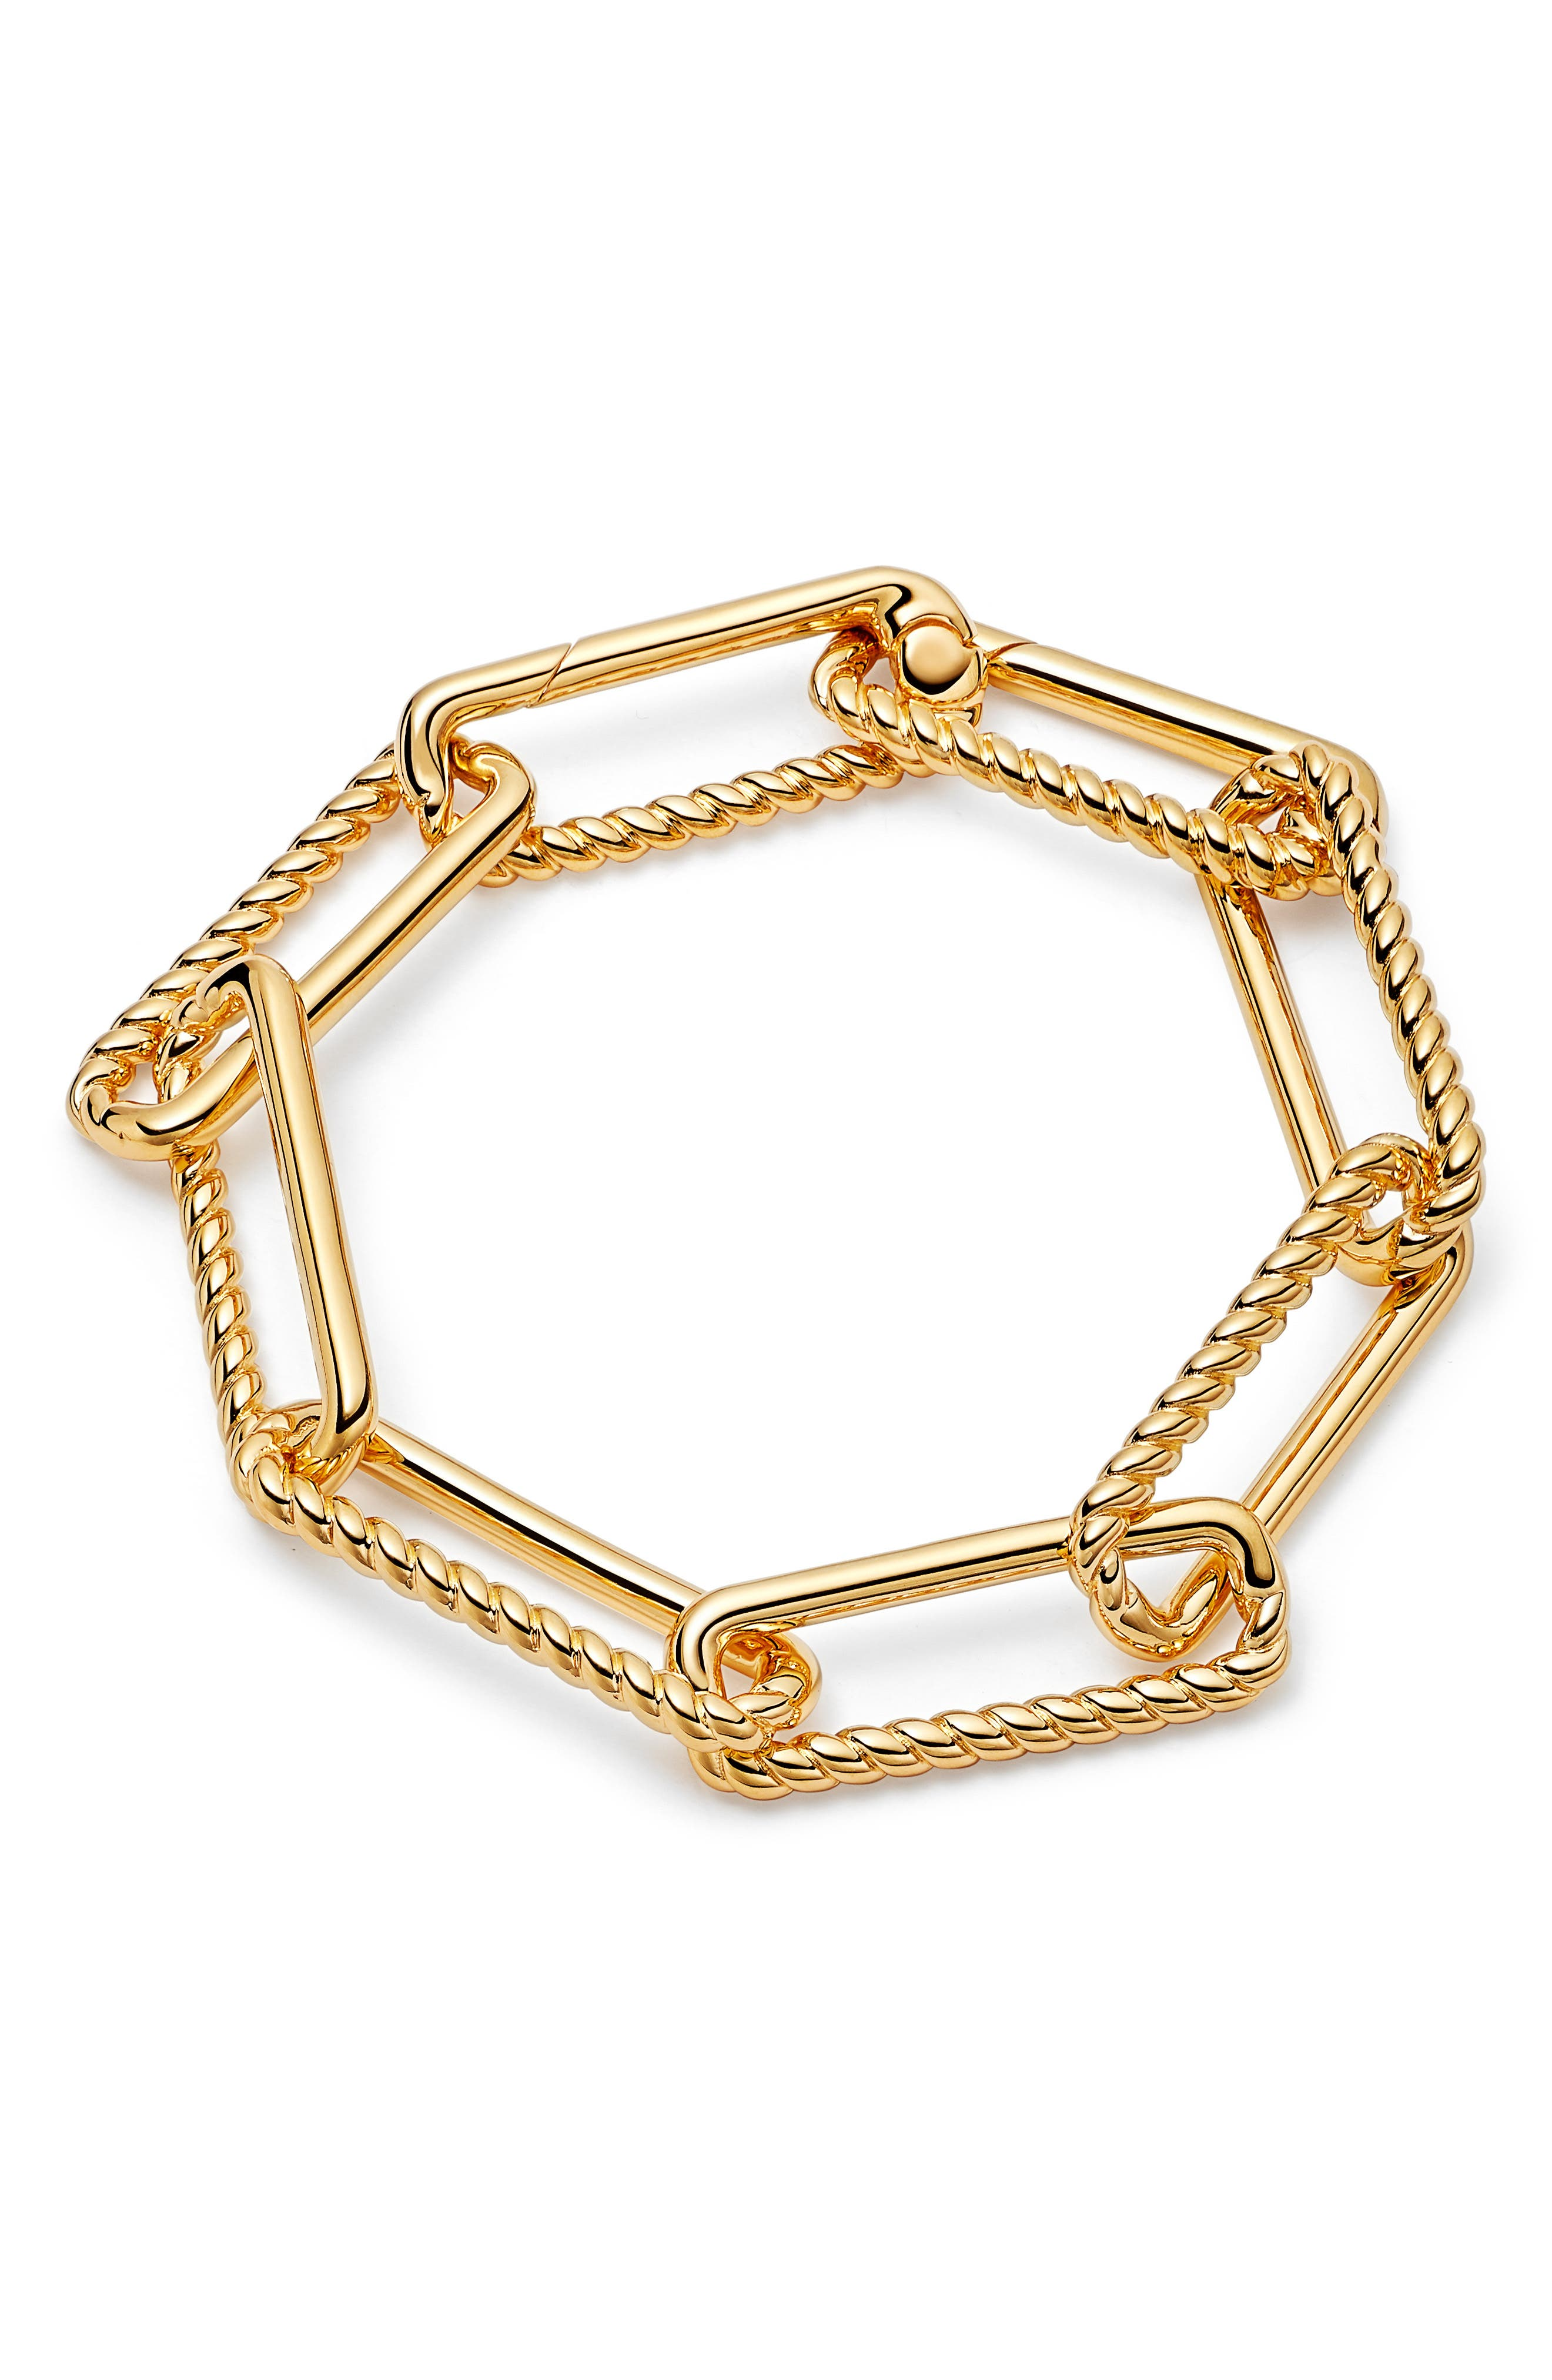 Chunky Rope & Link Bracelet